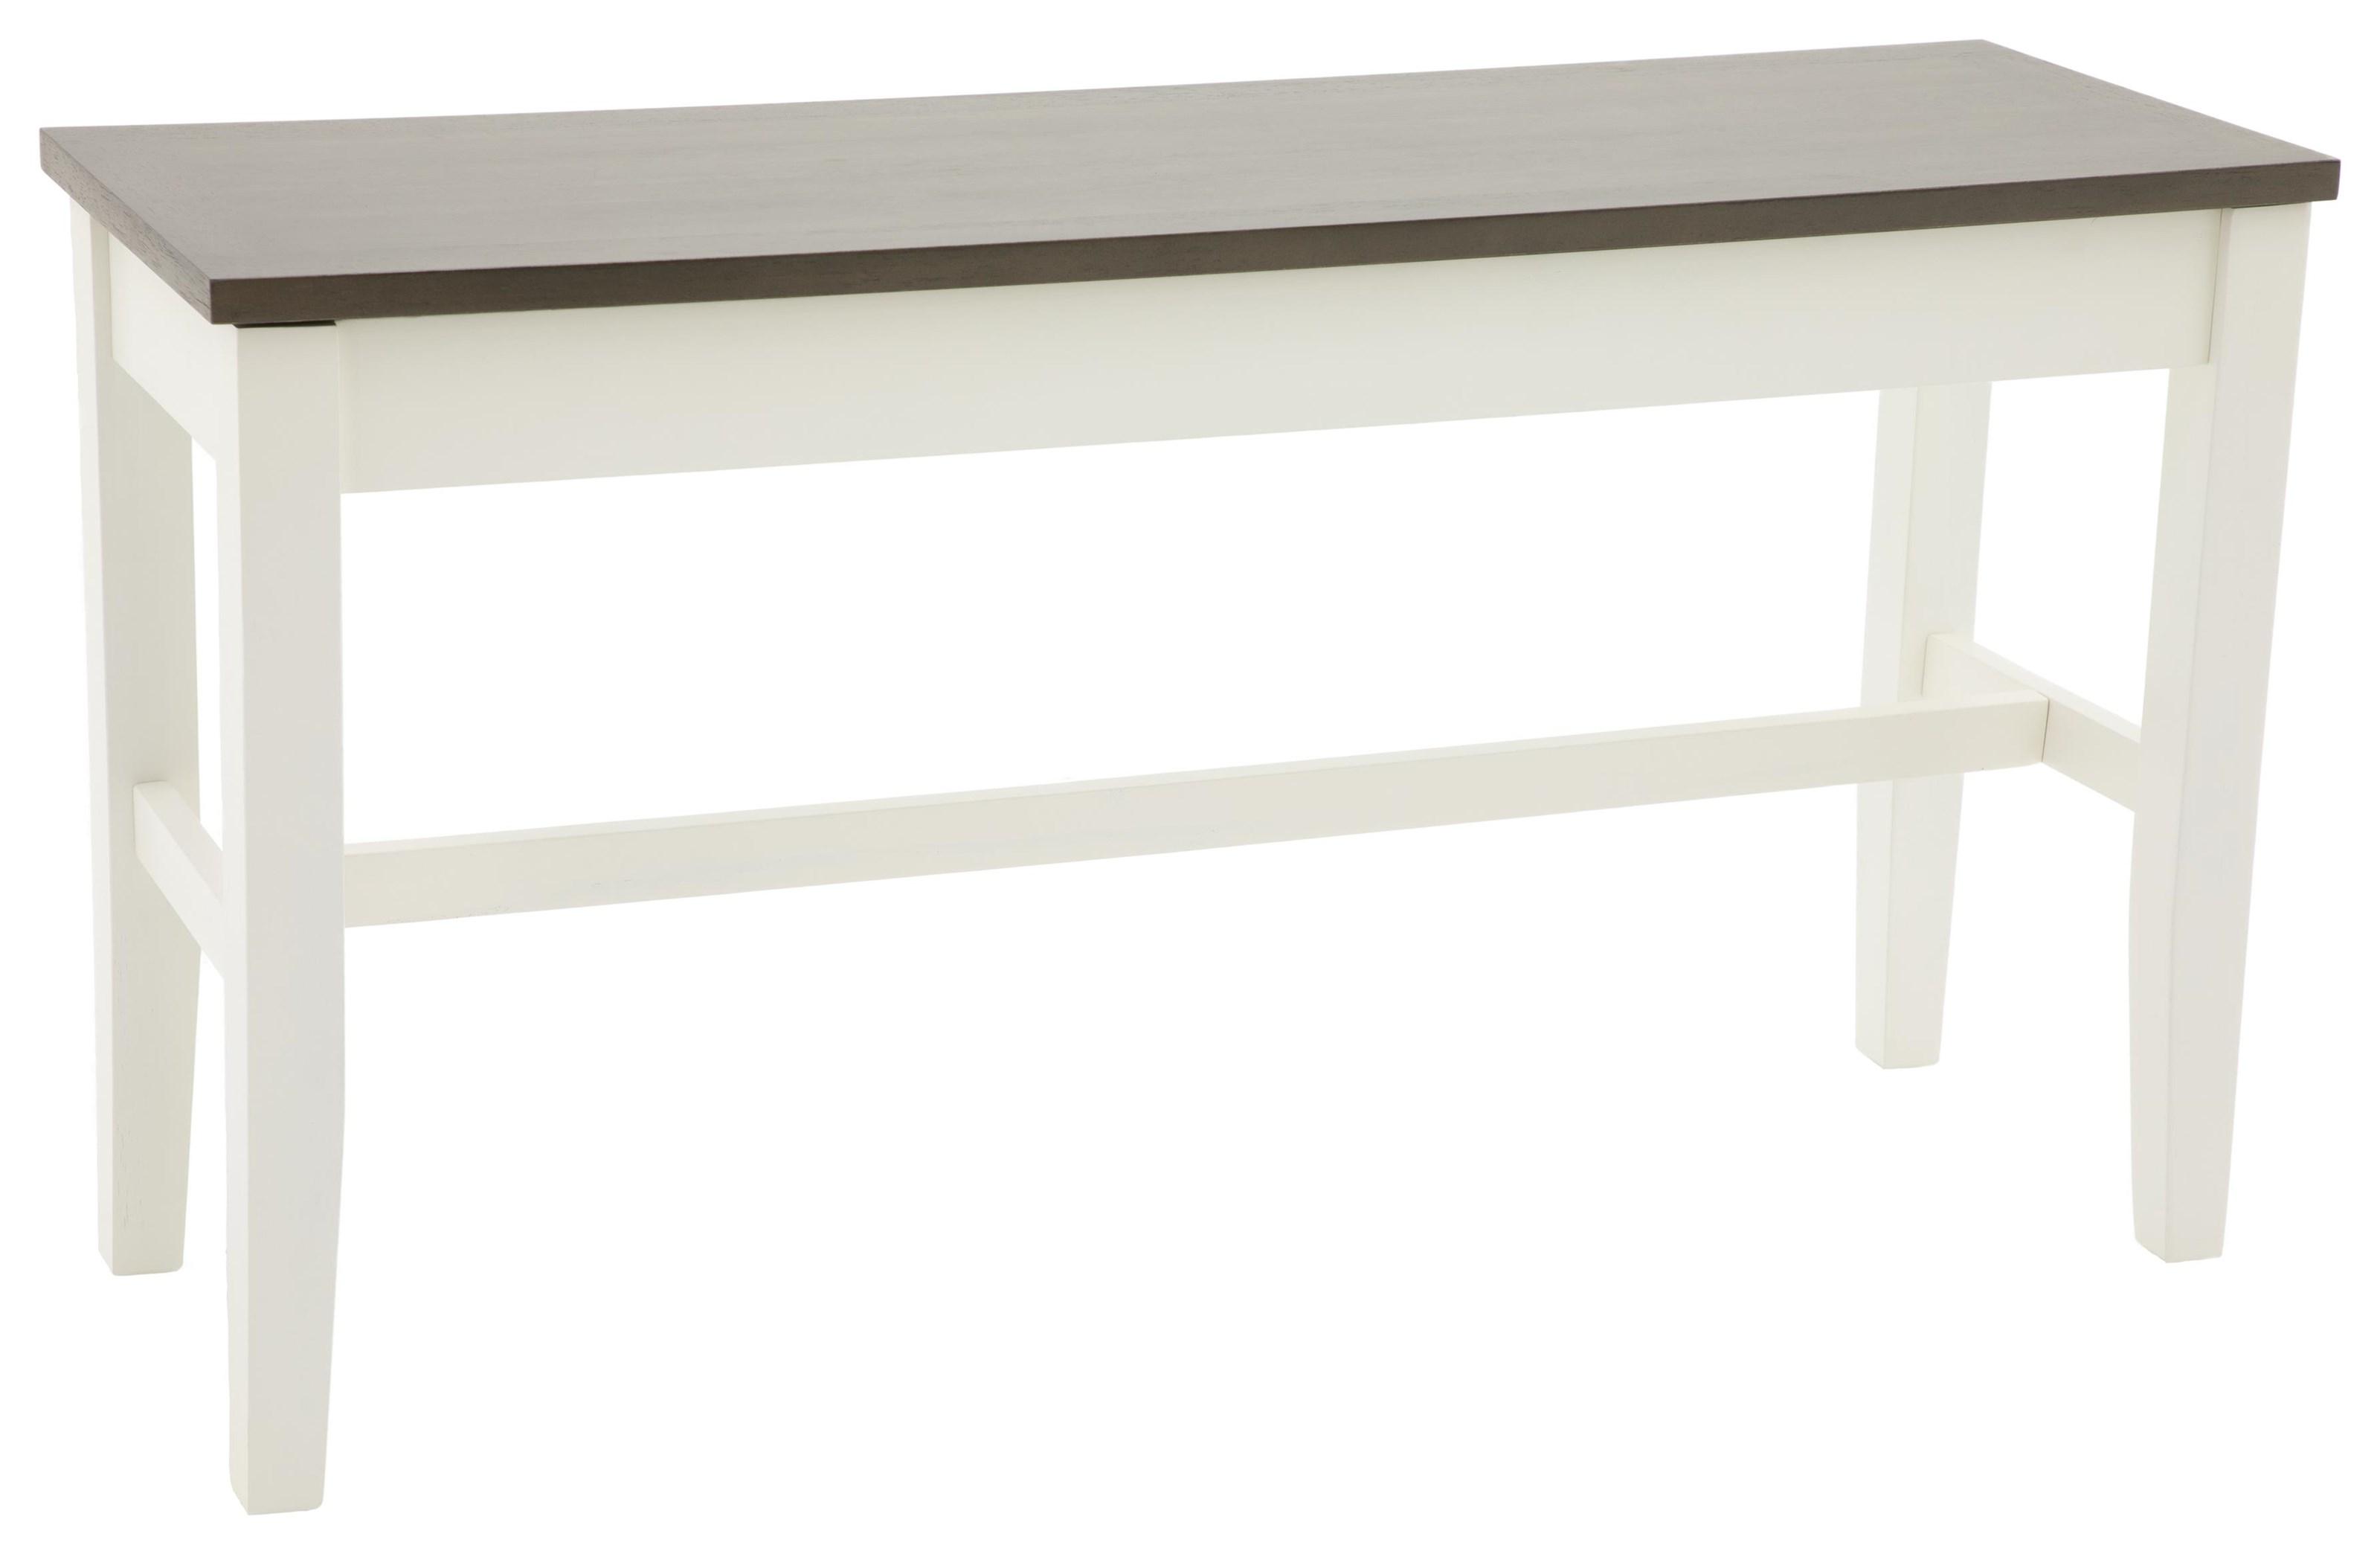 Carey White Carey Counter Height Storage Bench at Walker's Furniture